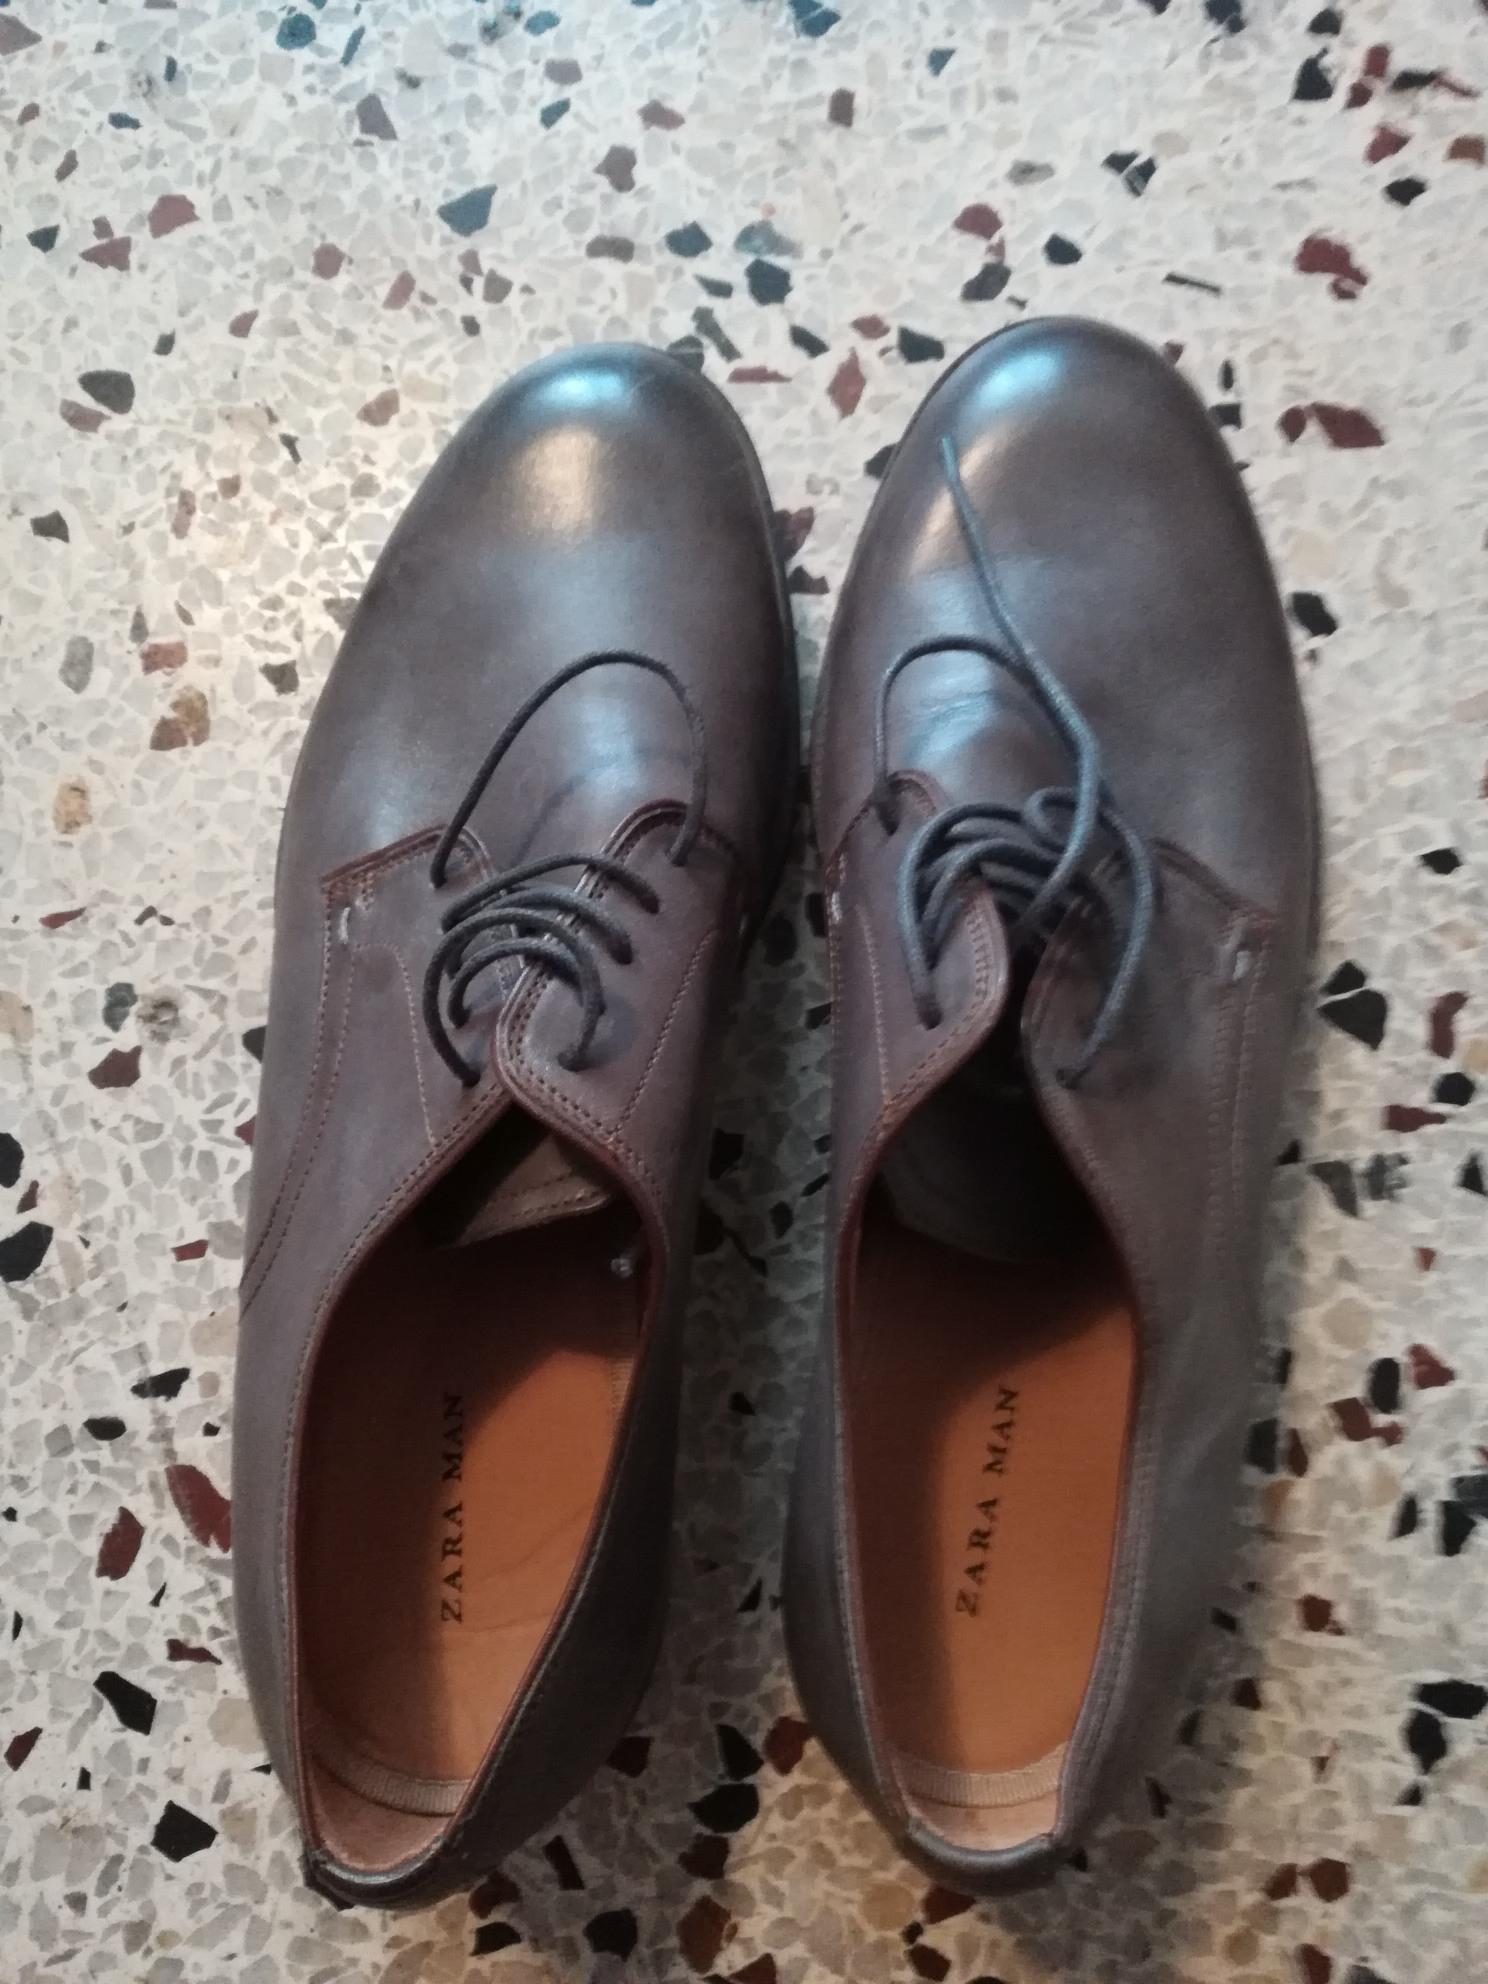 chaussures homme 16 Vertaizon (63)